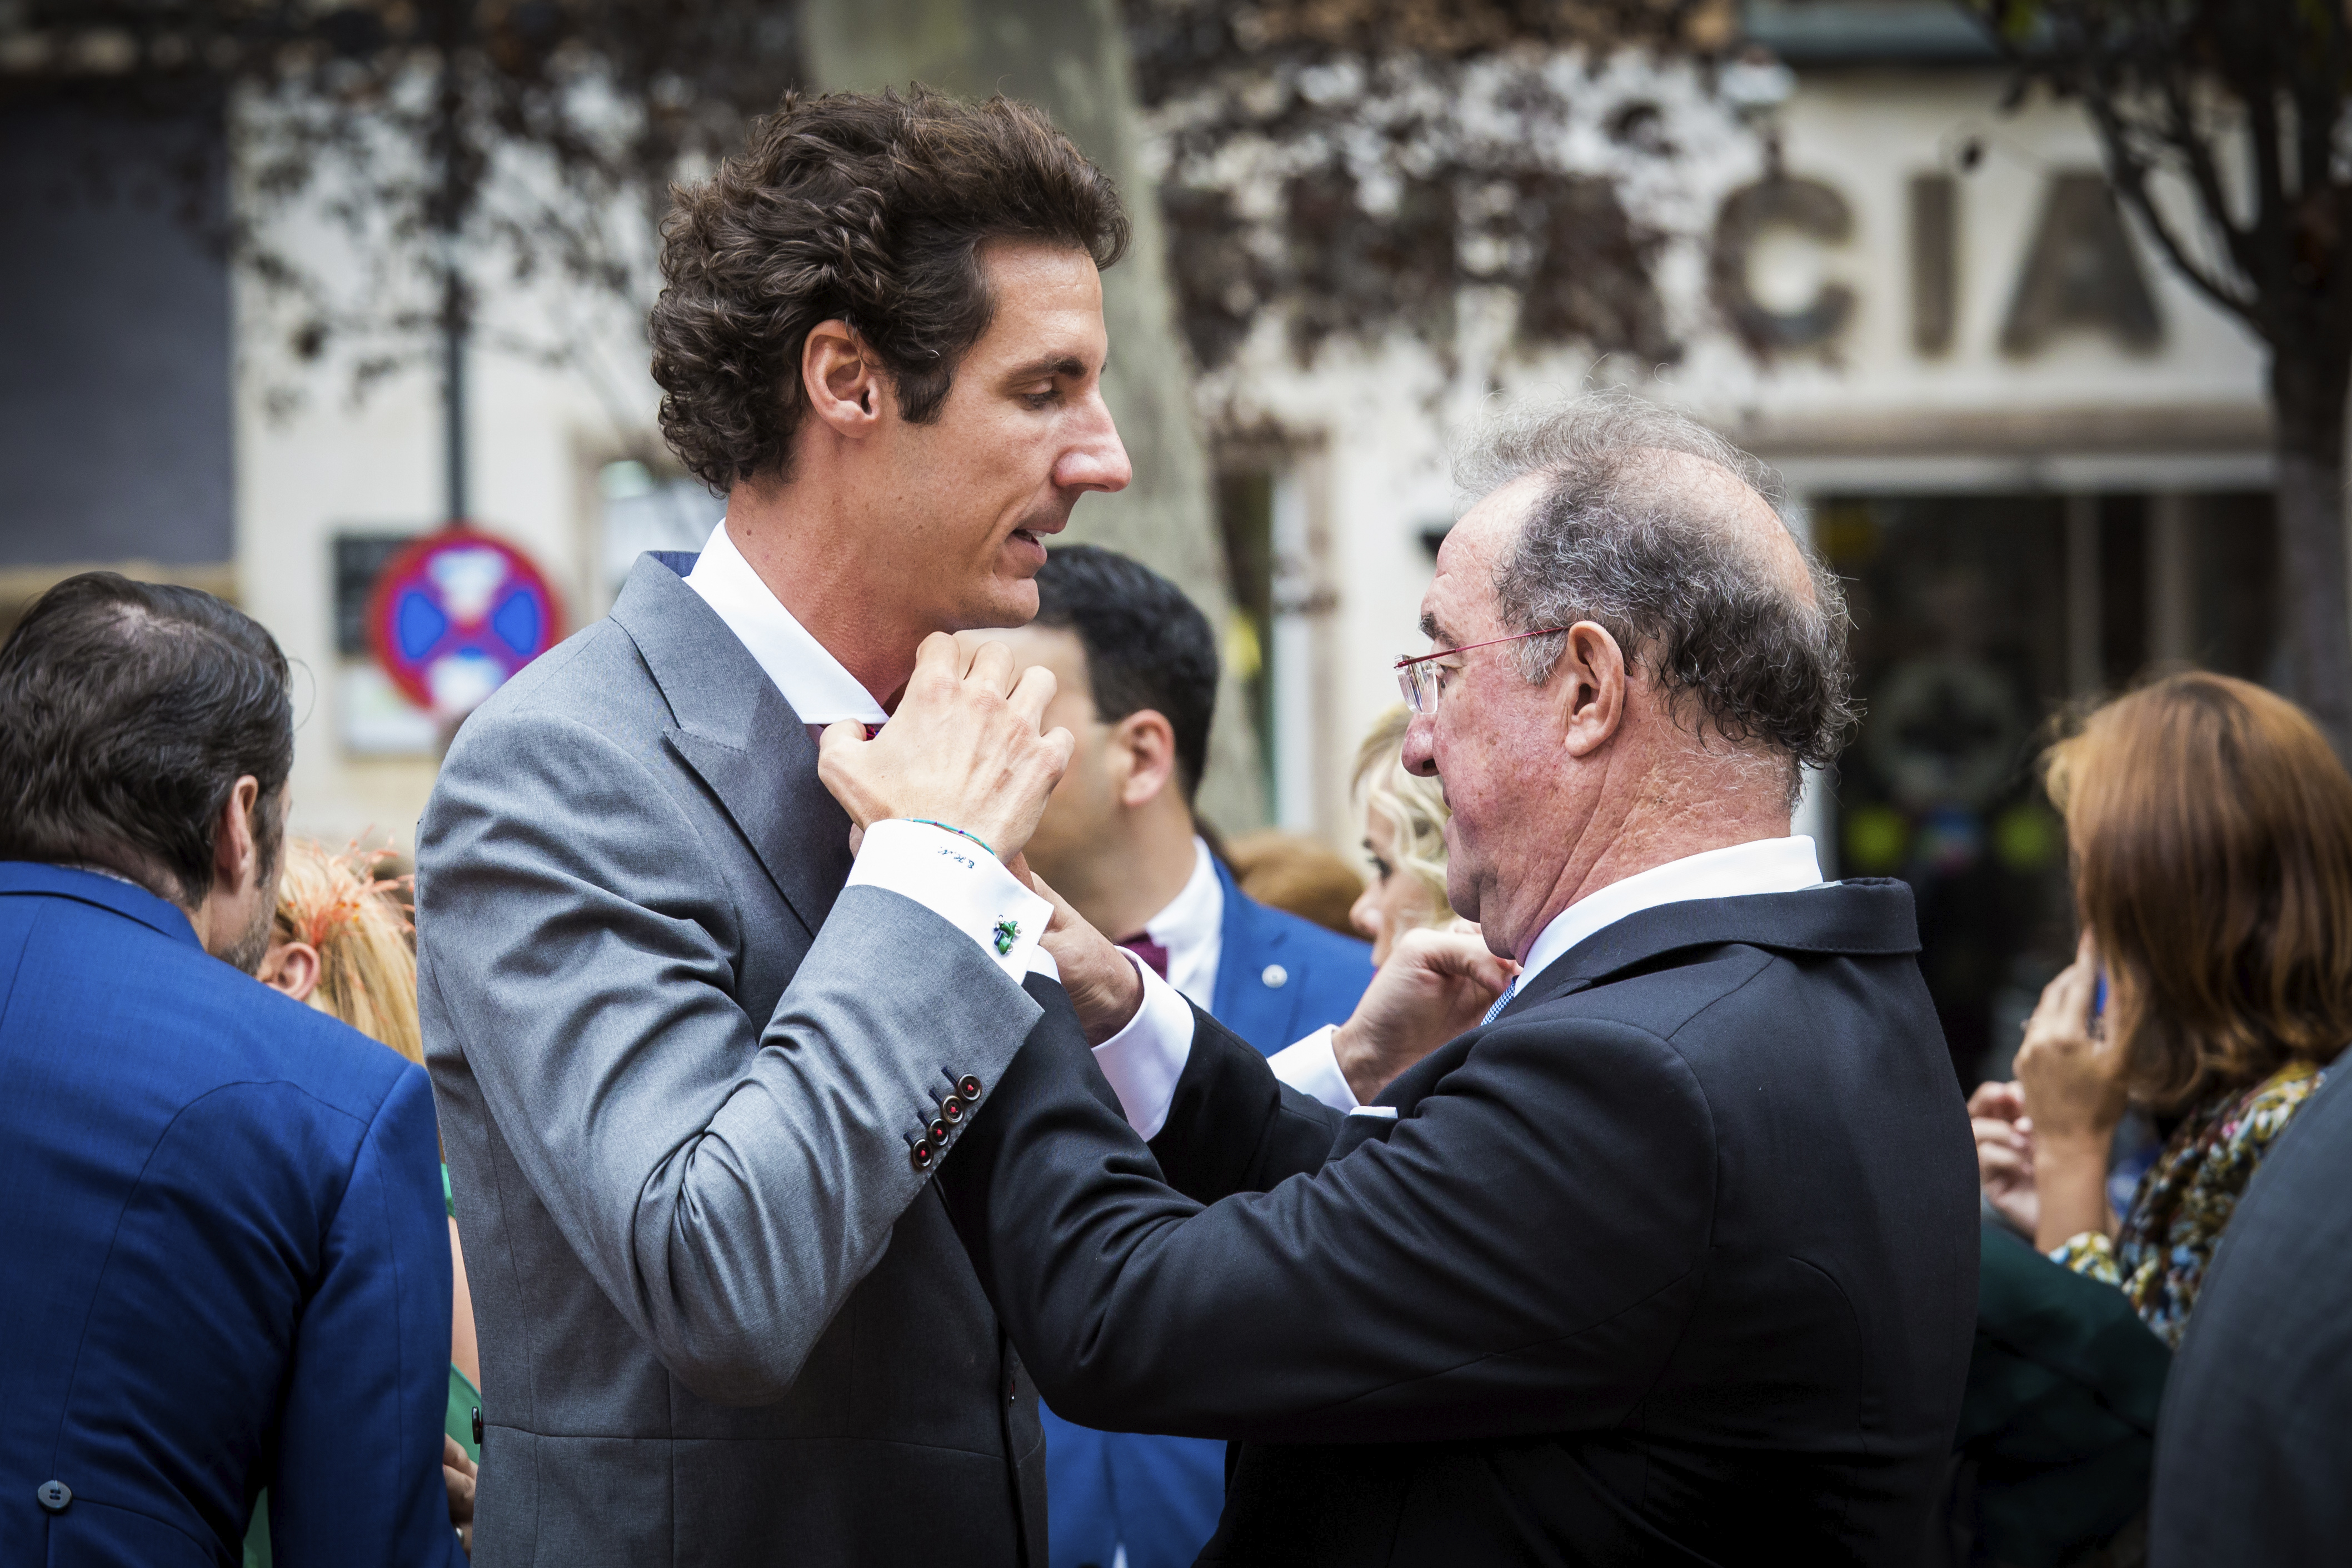 mandarina weddig, fotografos de boda, fotografo boda soria, fotografo boda barcelona, fotografo boda Madrid, fotografo boda lerida, fotografo boda Huesca_09